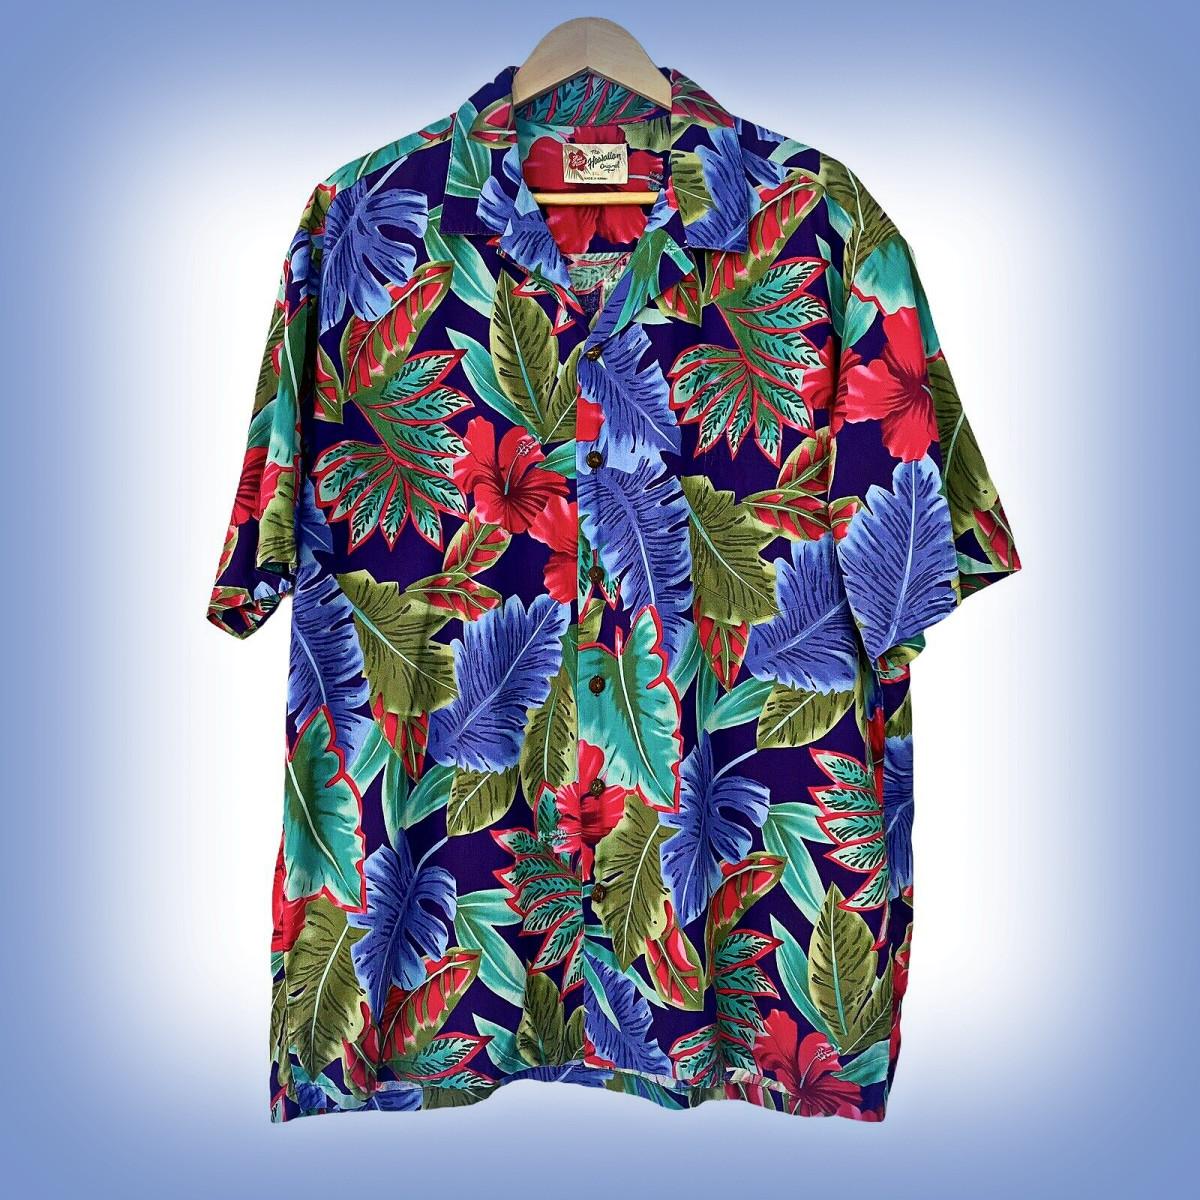 Hilo Hattie Colorful Men's 2XL Cotton Short Sleeve Hawaiian Shirt Floral Palm Leaf … An amazing Floral Print Short Sleeve shirt.